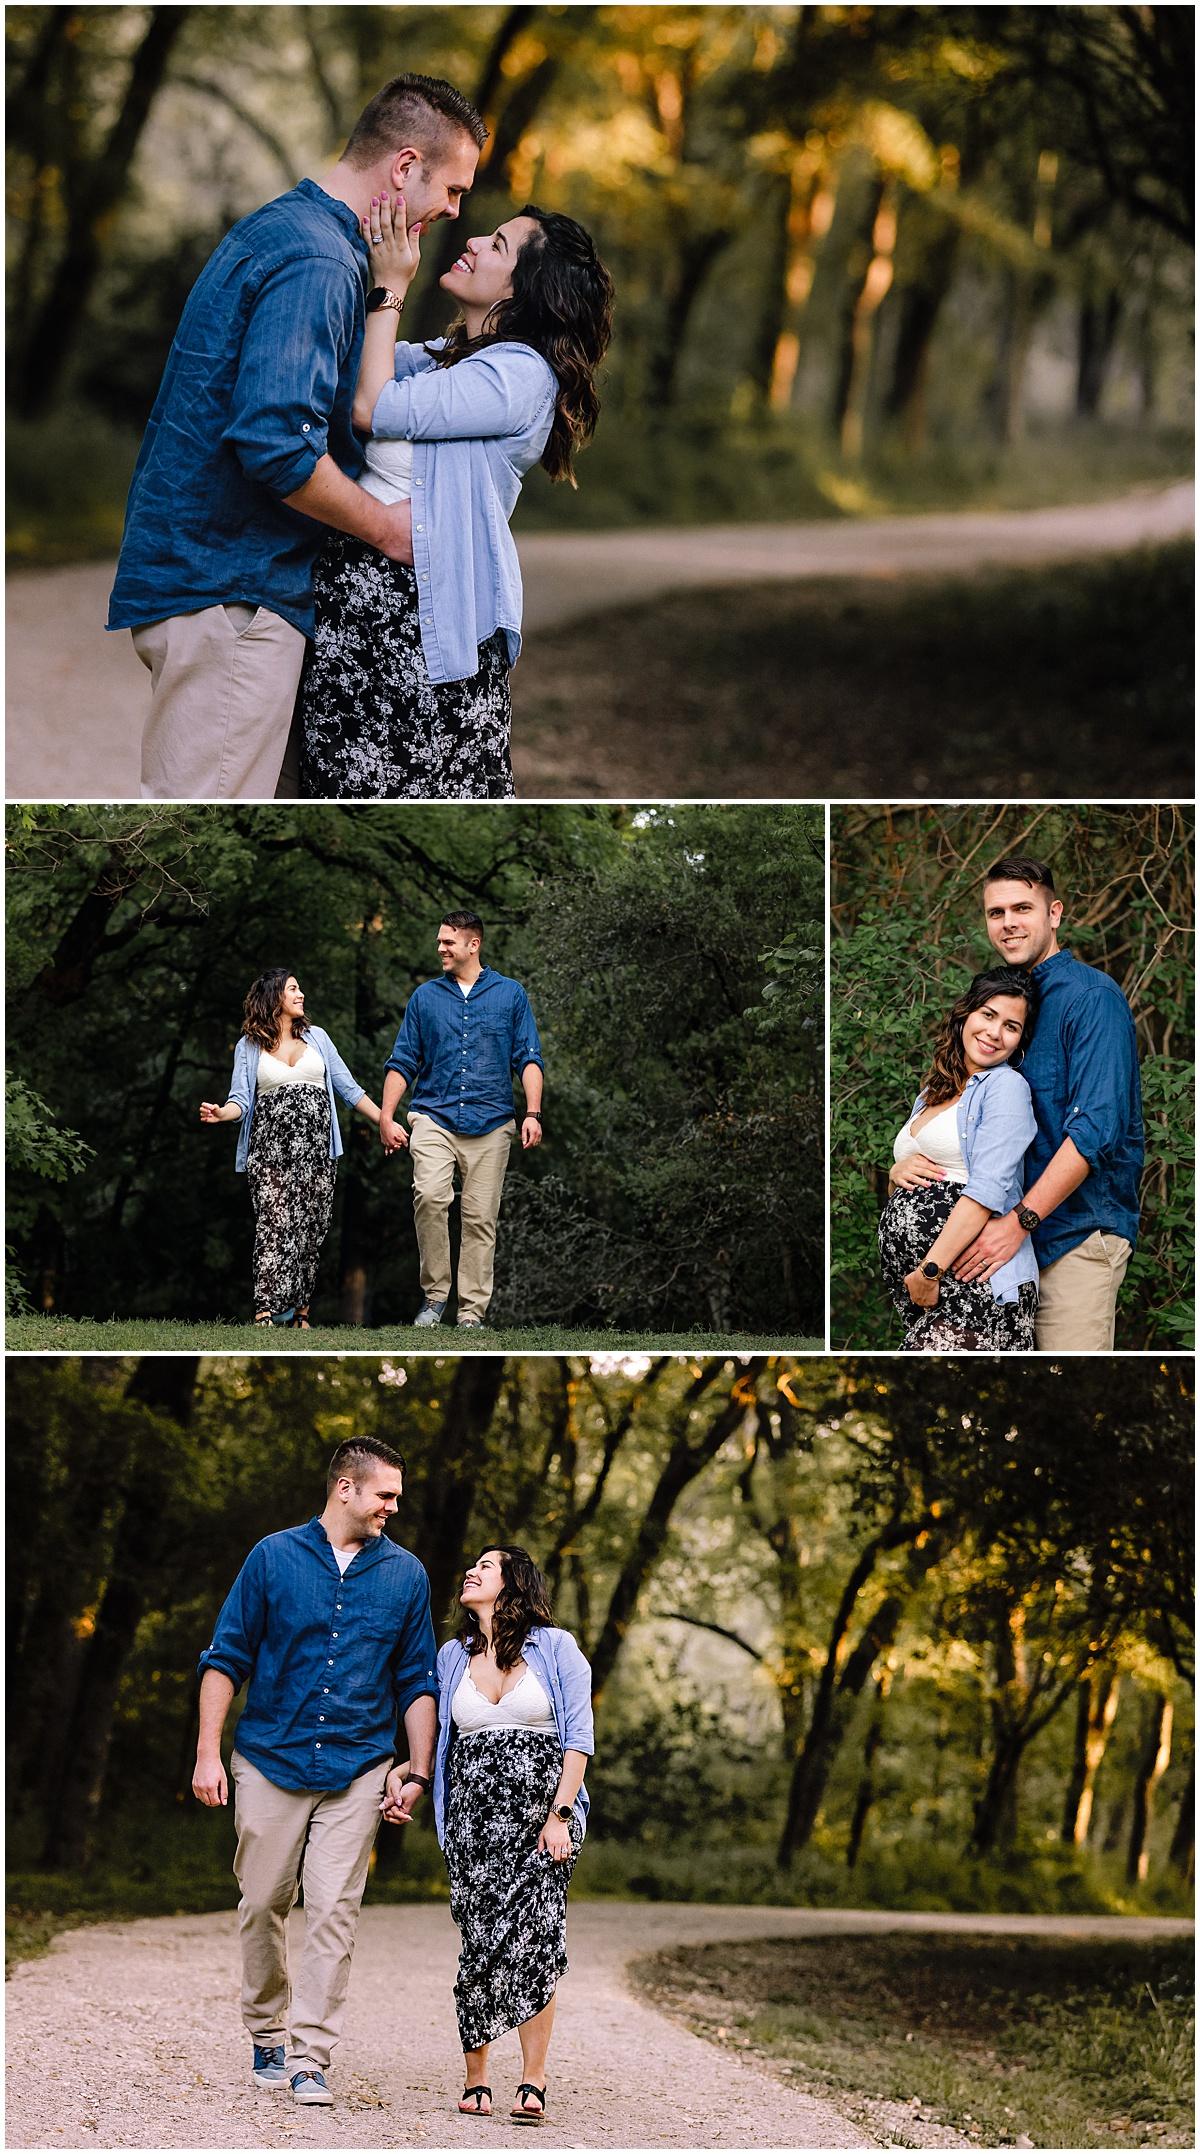 Maternity-Photo-Session-Brakenridge-Park-San-Antonio-Texas-Carly-Barton-Photography_0006.jpg